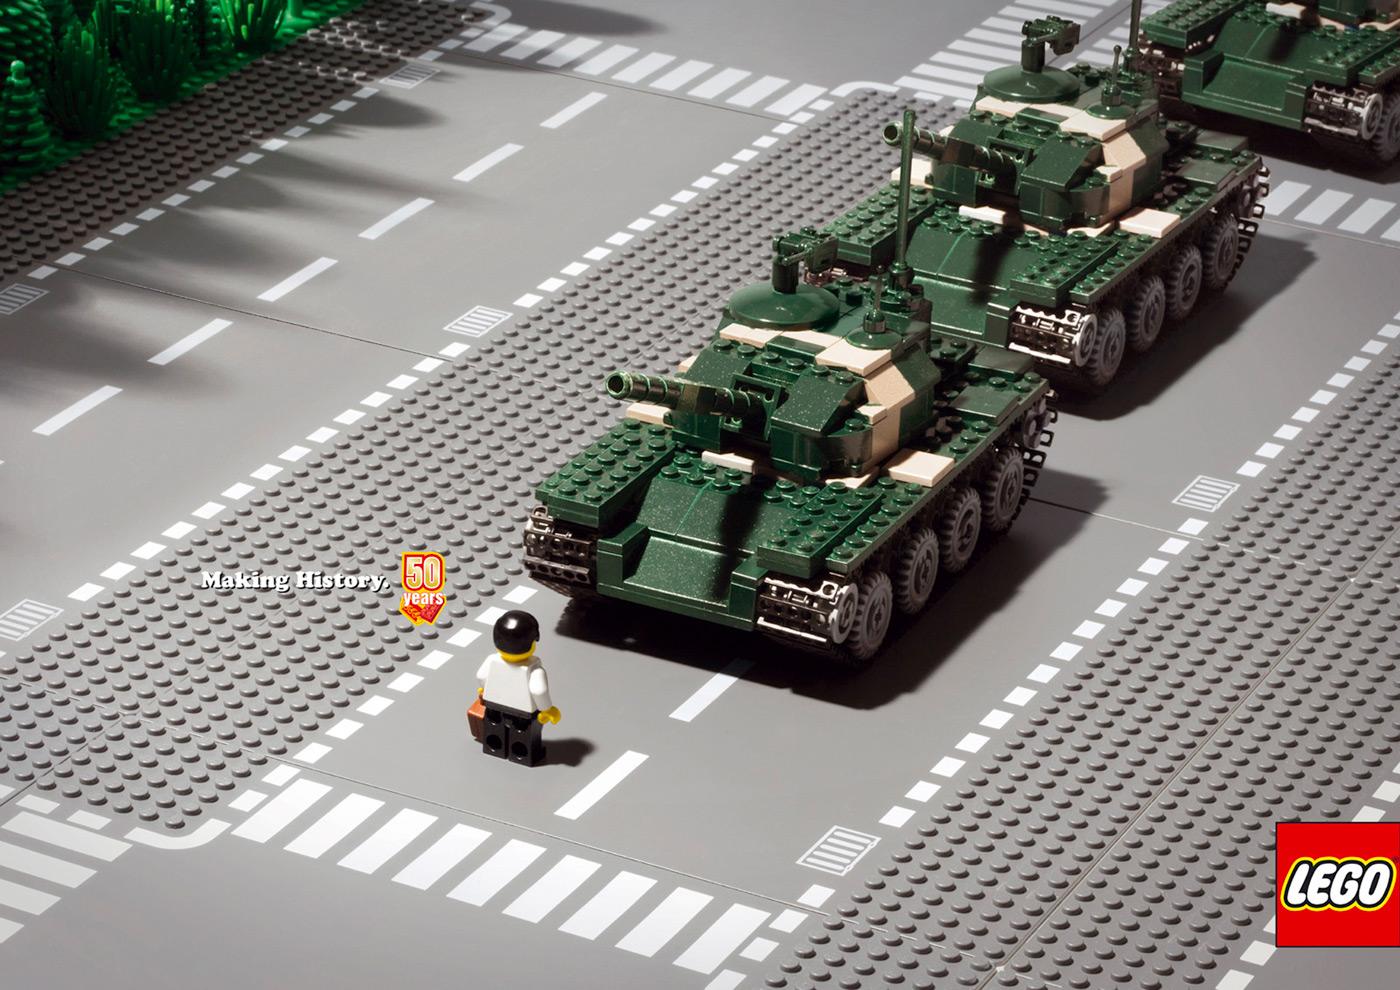 http://4.bp.blogspot.com/-jddidsUF7Yk/TnJ-gtQ0xxI/AAAAAAAADDU/yNizwY6SOkg/s1600/Lego_China_History_Riot_HD_Wallpaper_Vvallpaper.Net.jpg